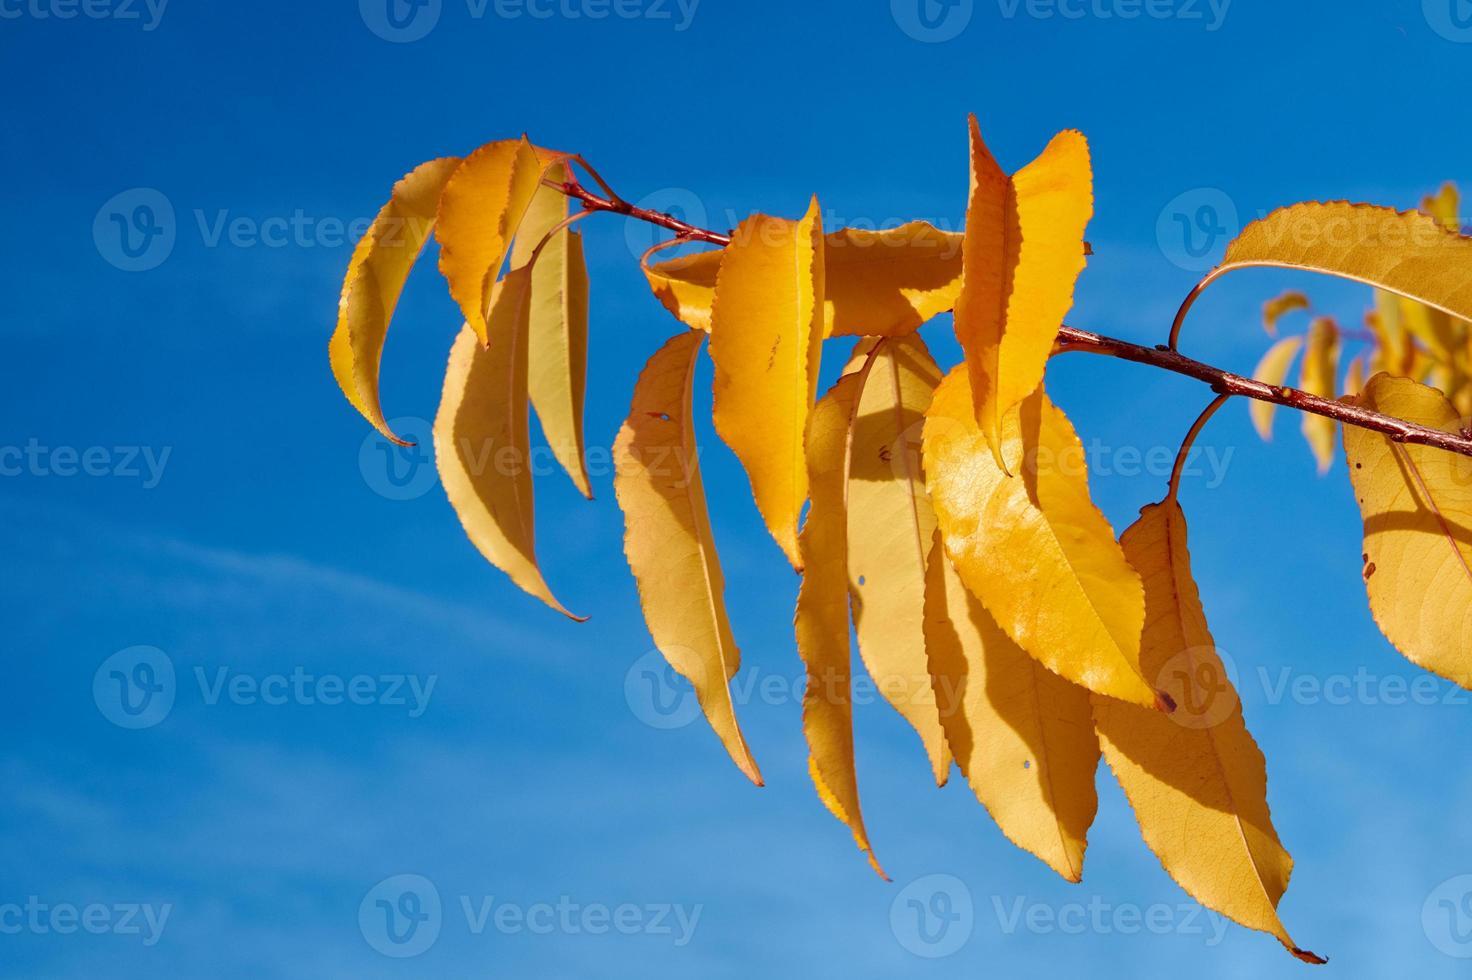 bunte Herbstblätter gegen den Himmel foto